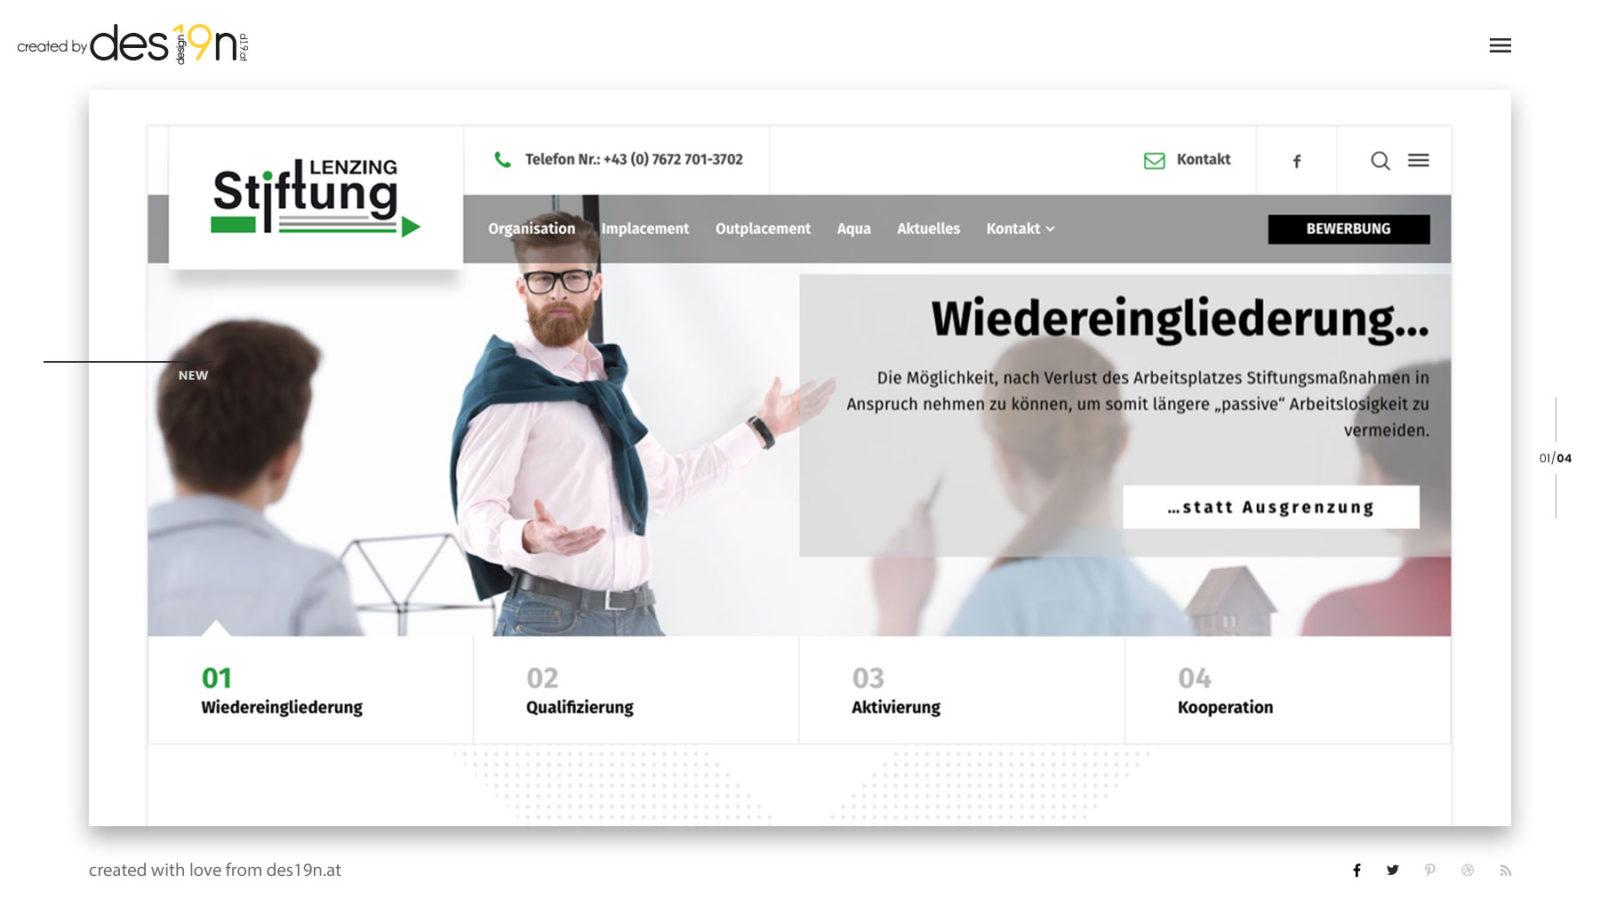 Webdesign für Kunde Lenzing-Stiftung - responsive Webdesign